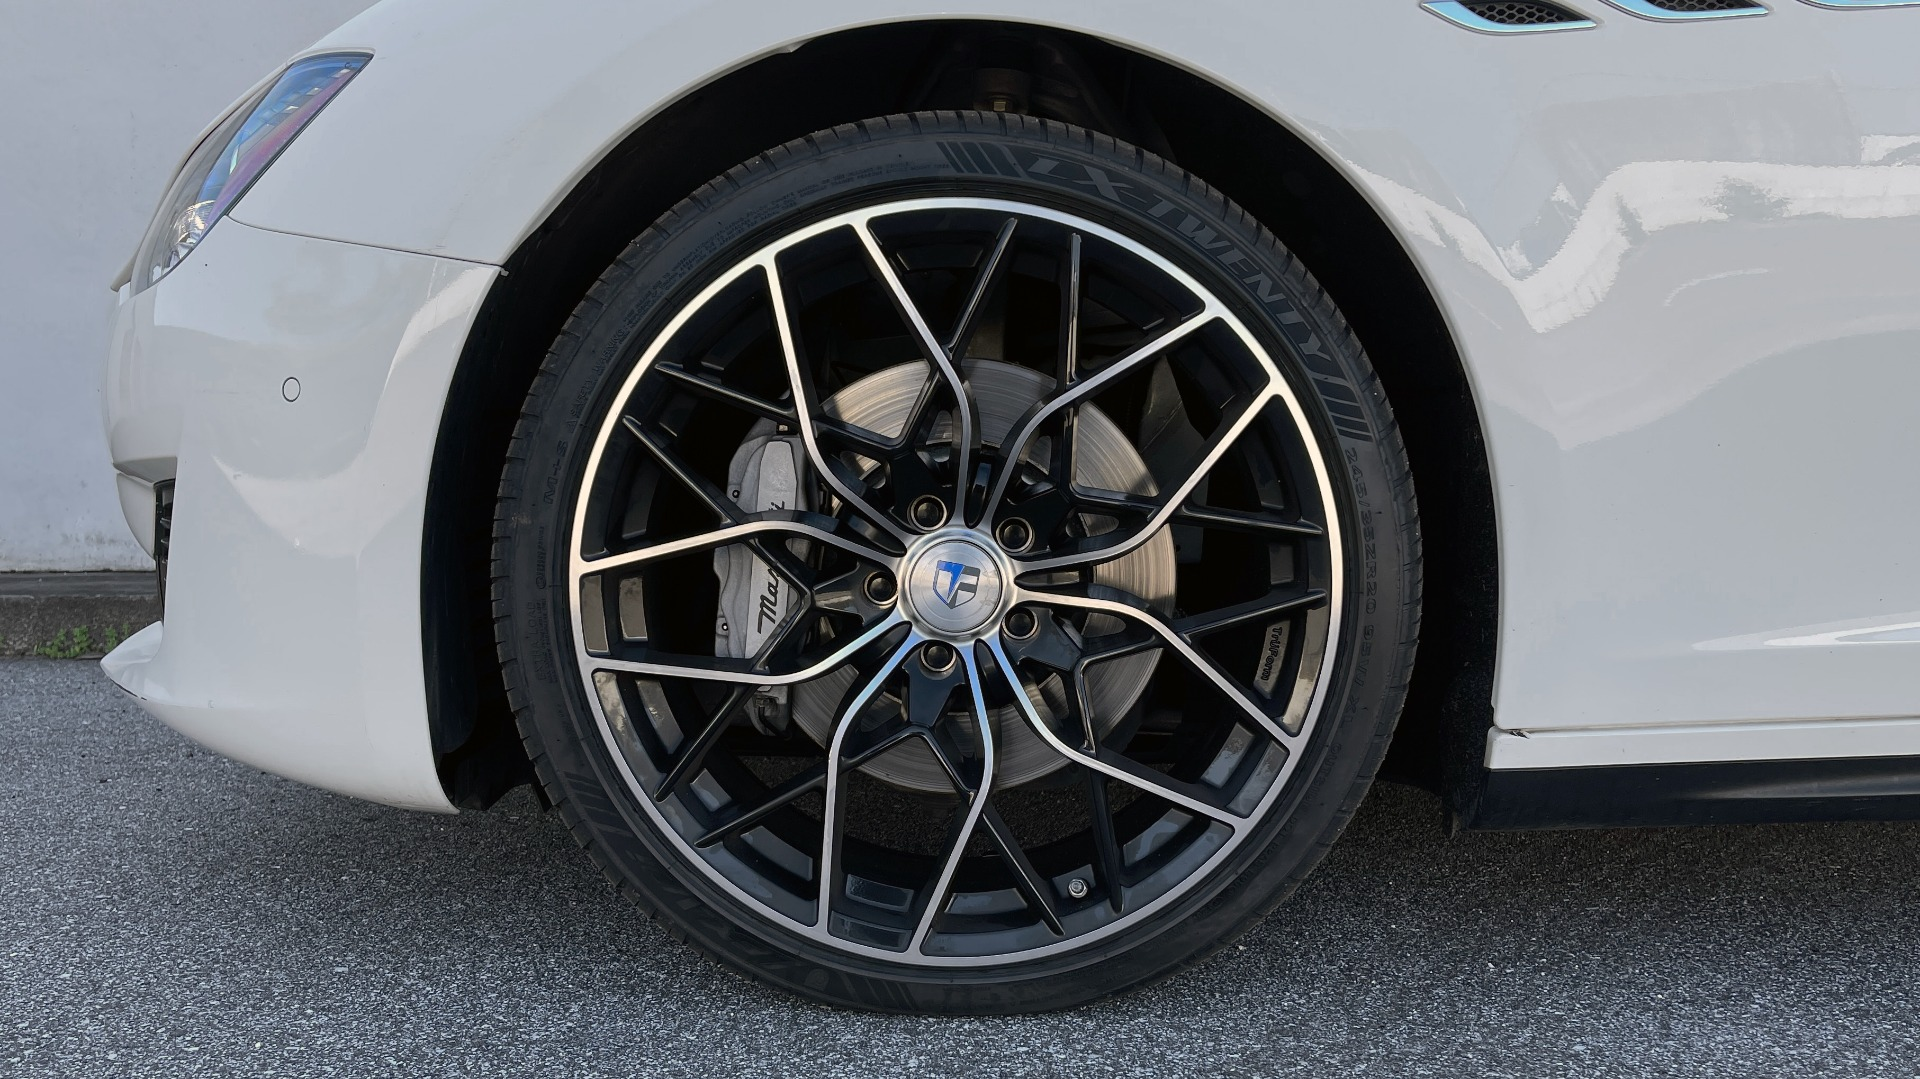 Used 2018 Maserati GHIBLI SEDAN / RWD / 3.0L V6 / SUNROOF / NAV / REARVIEW for sale $42,995 at Formula Imports in Charlotte NC 28227 61